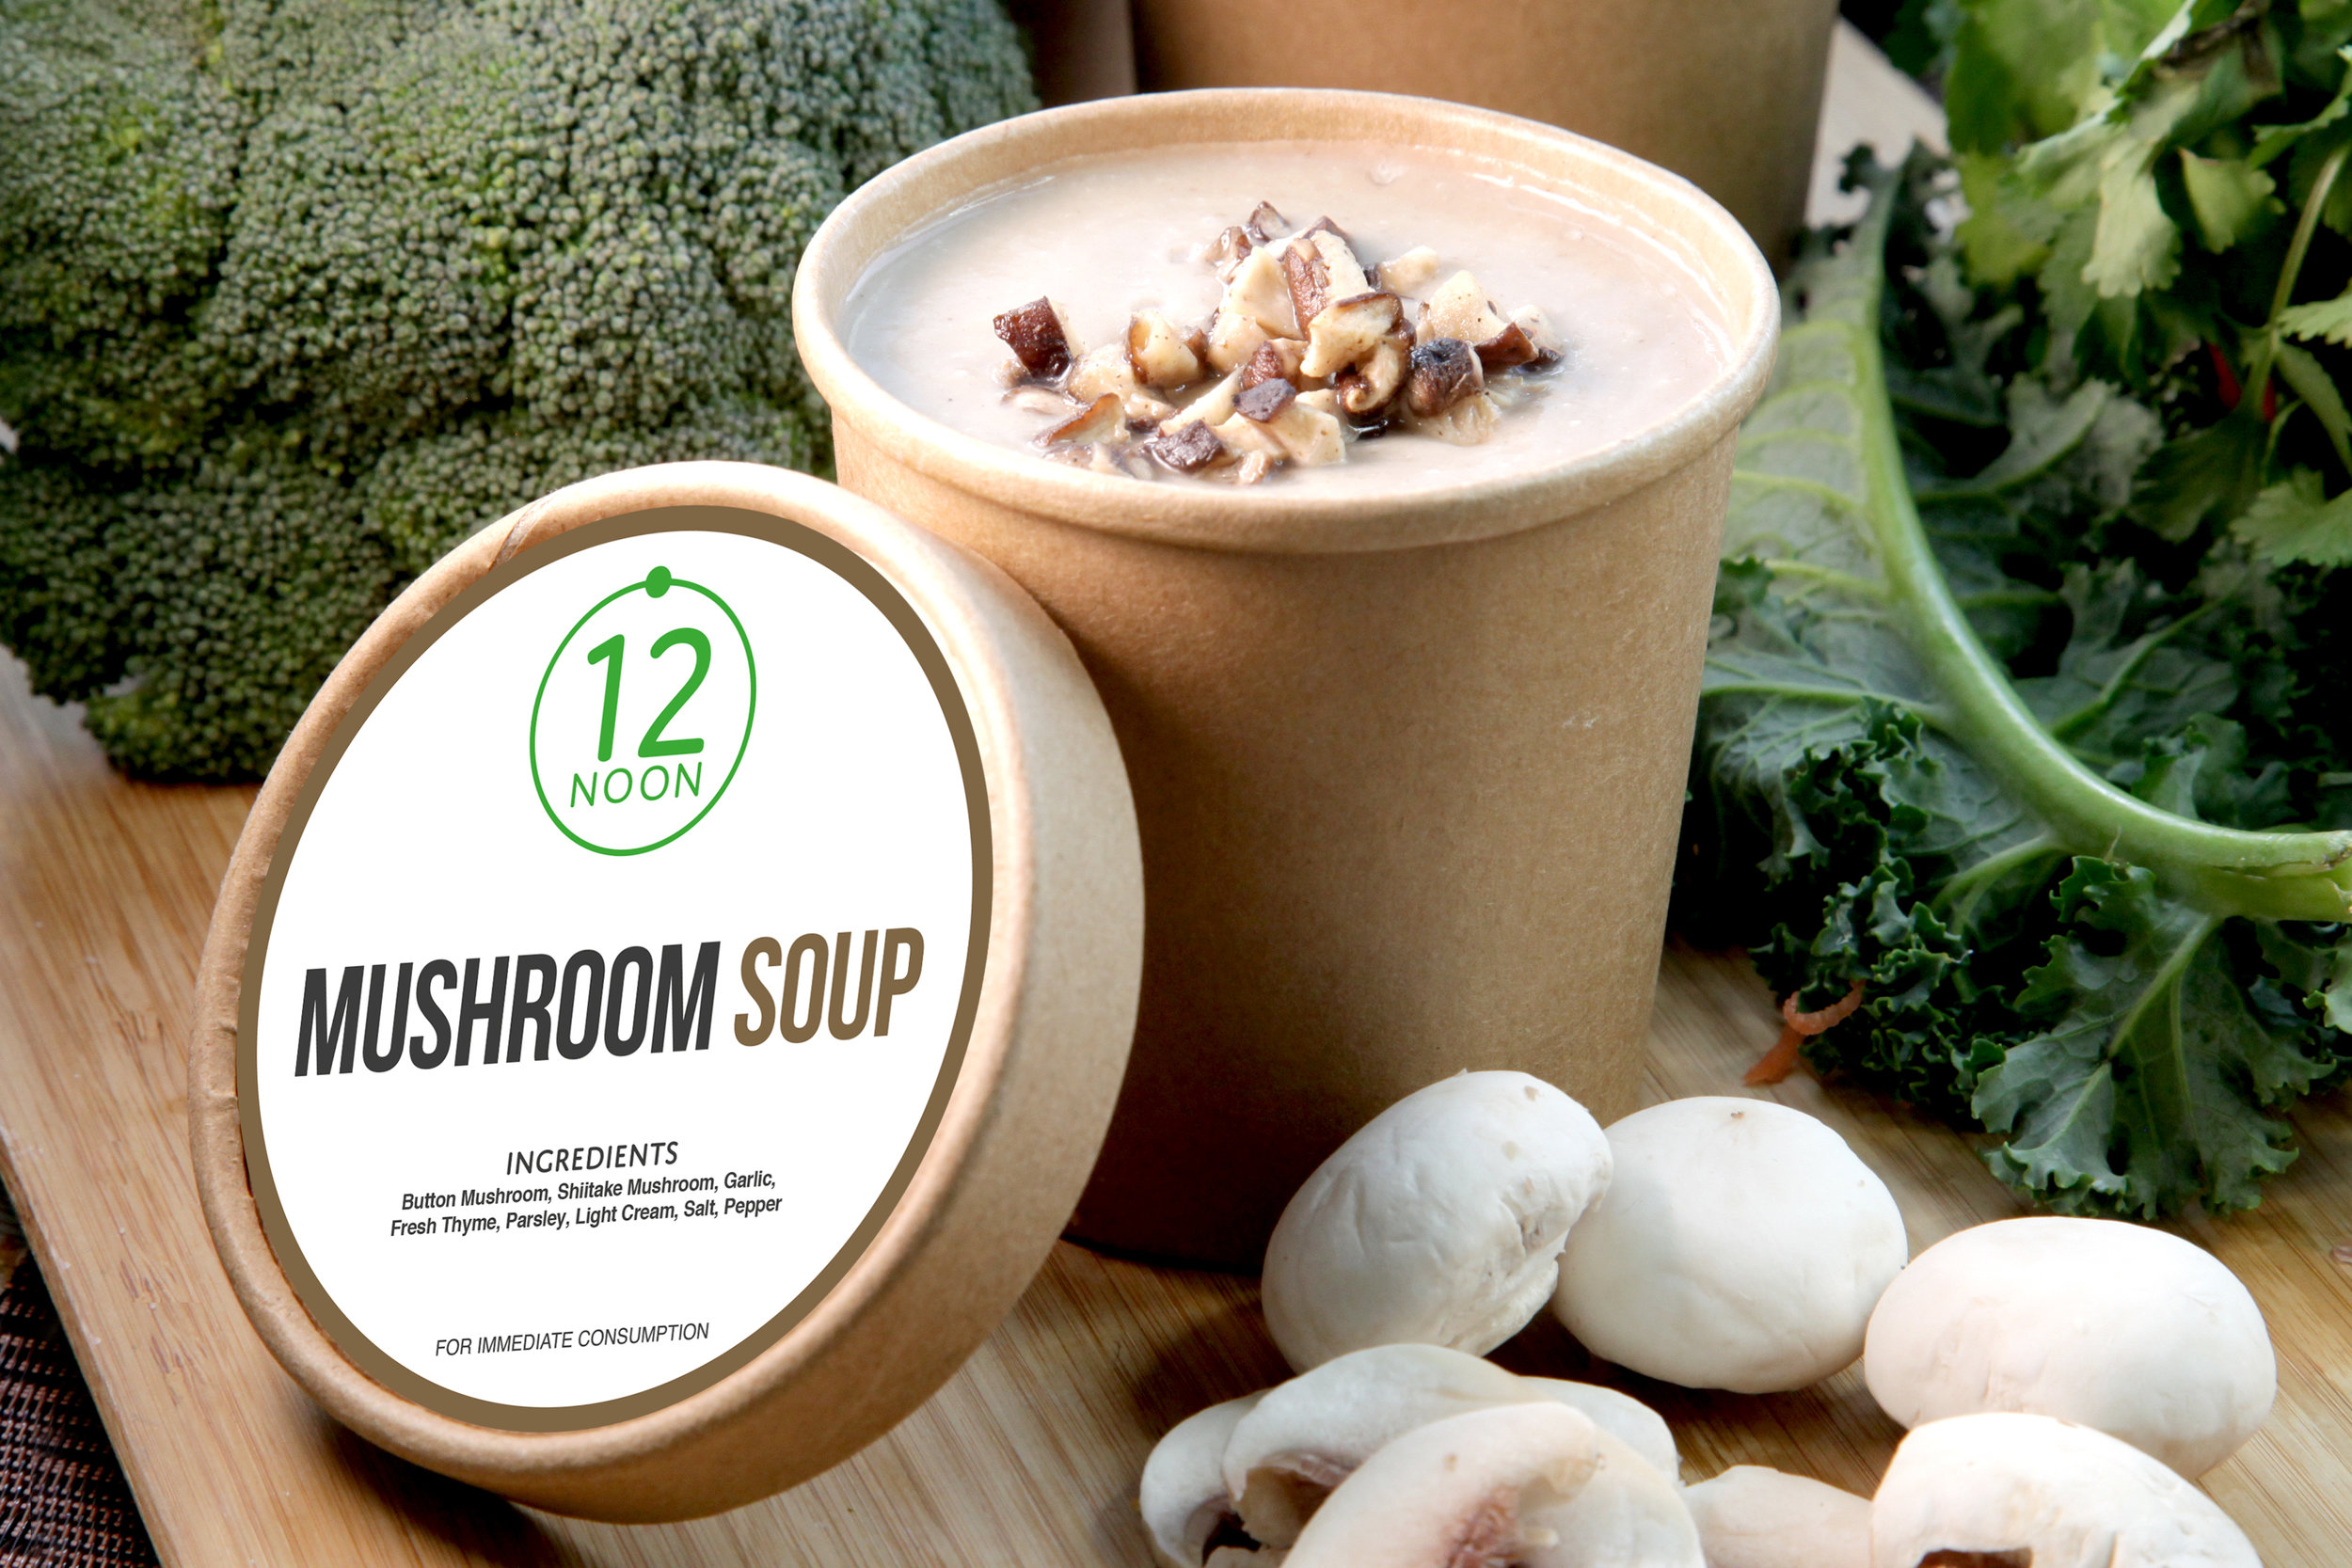 MUSHROOM SOUP - 380 KCAL PER SERVINGButton Mushroom, Shiitake Mushroom, Garlic, Salt, Fresh Thyme, Parsley, Light Cream.$28